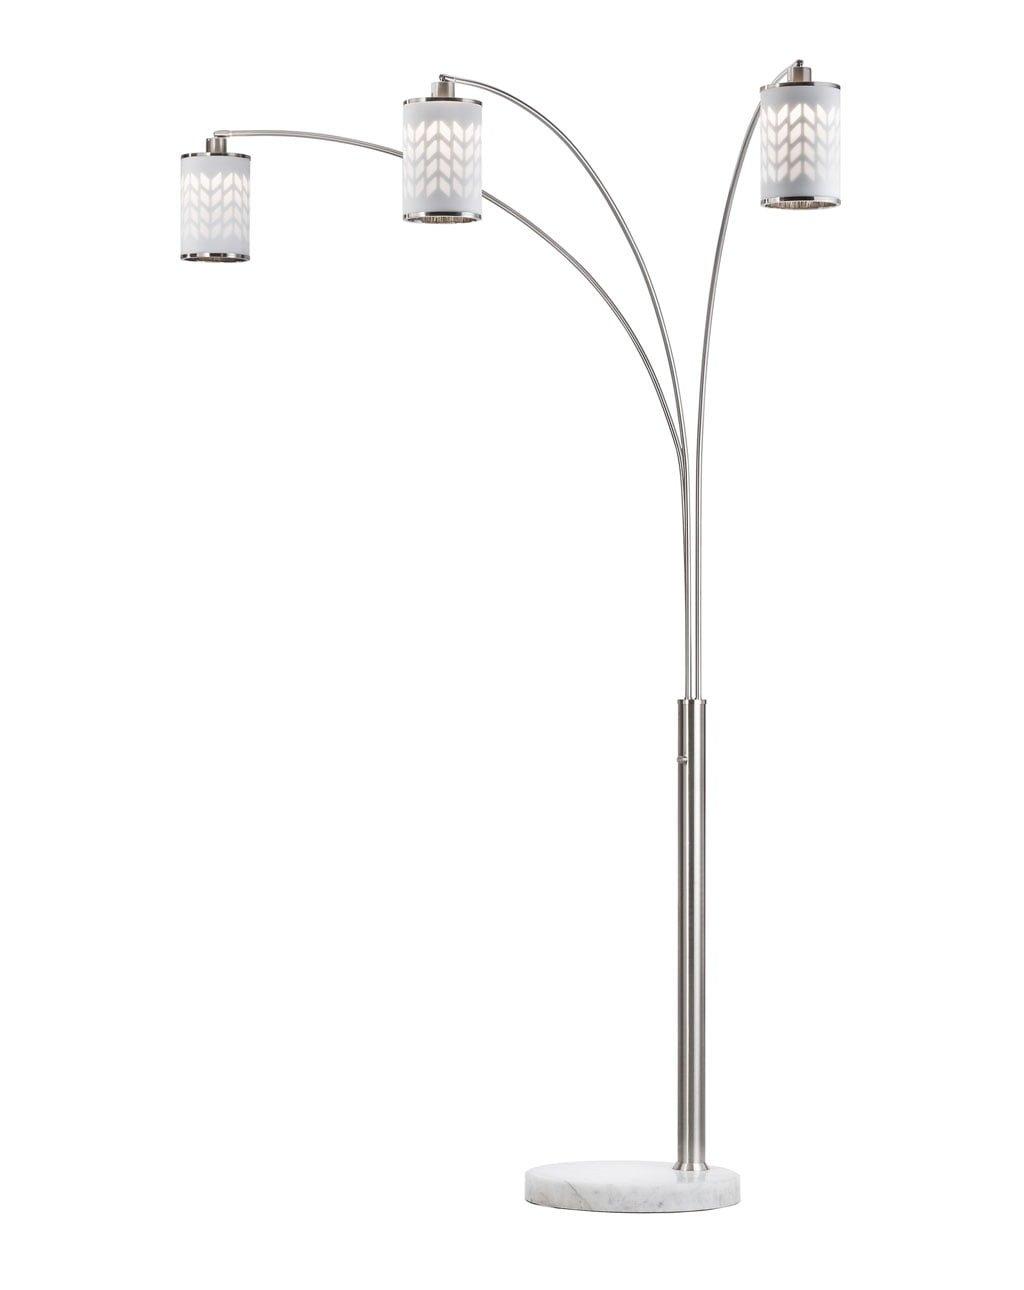 Flora 3-Light Arc Lamp, Weathered brass